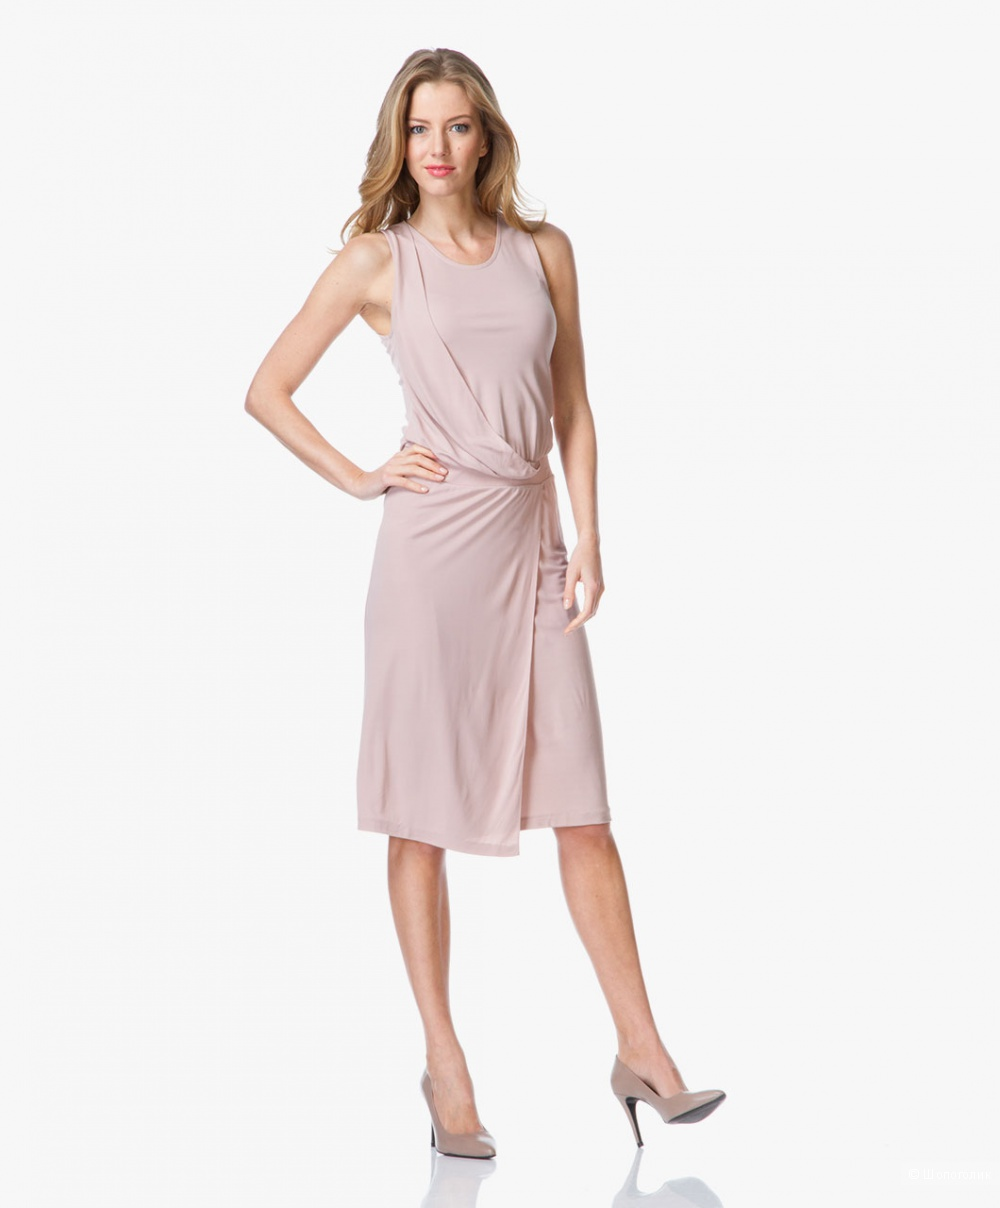 Filippa K. платье красивое, размер S